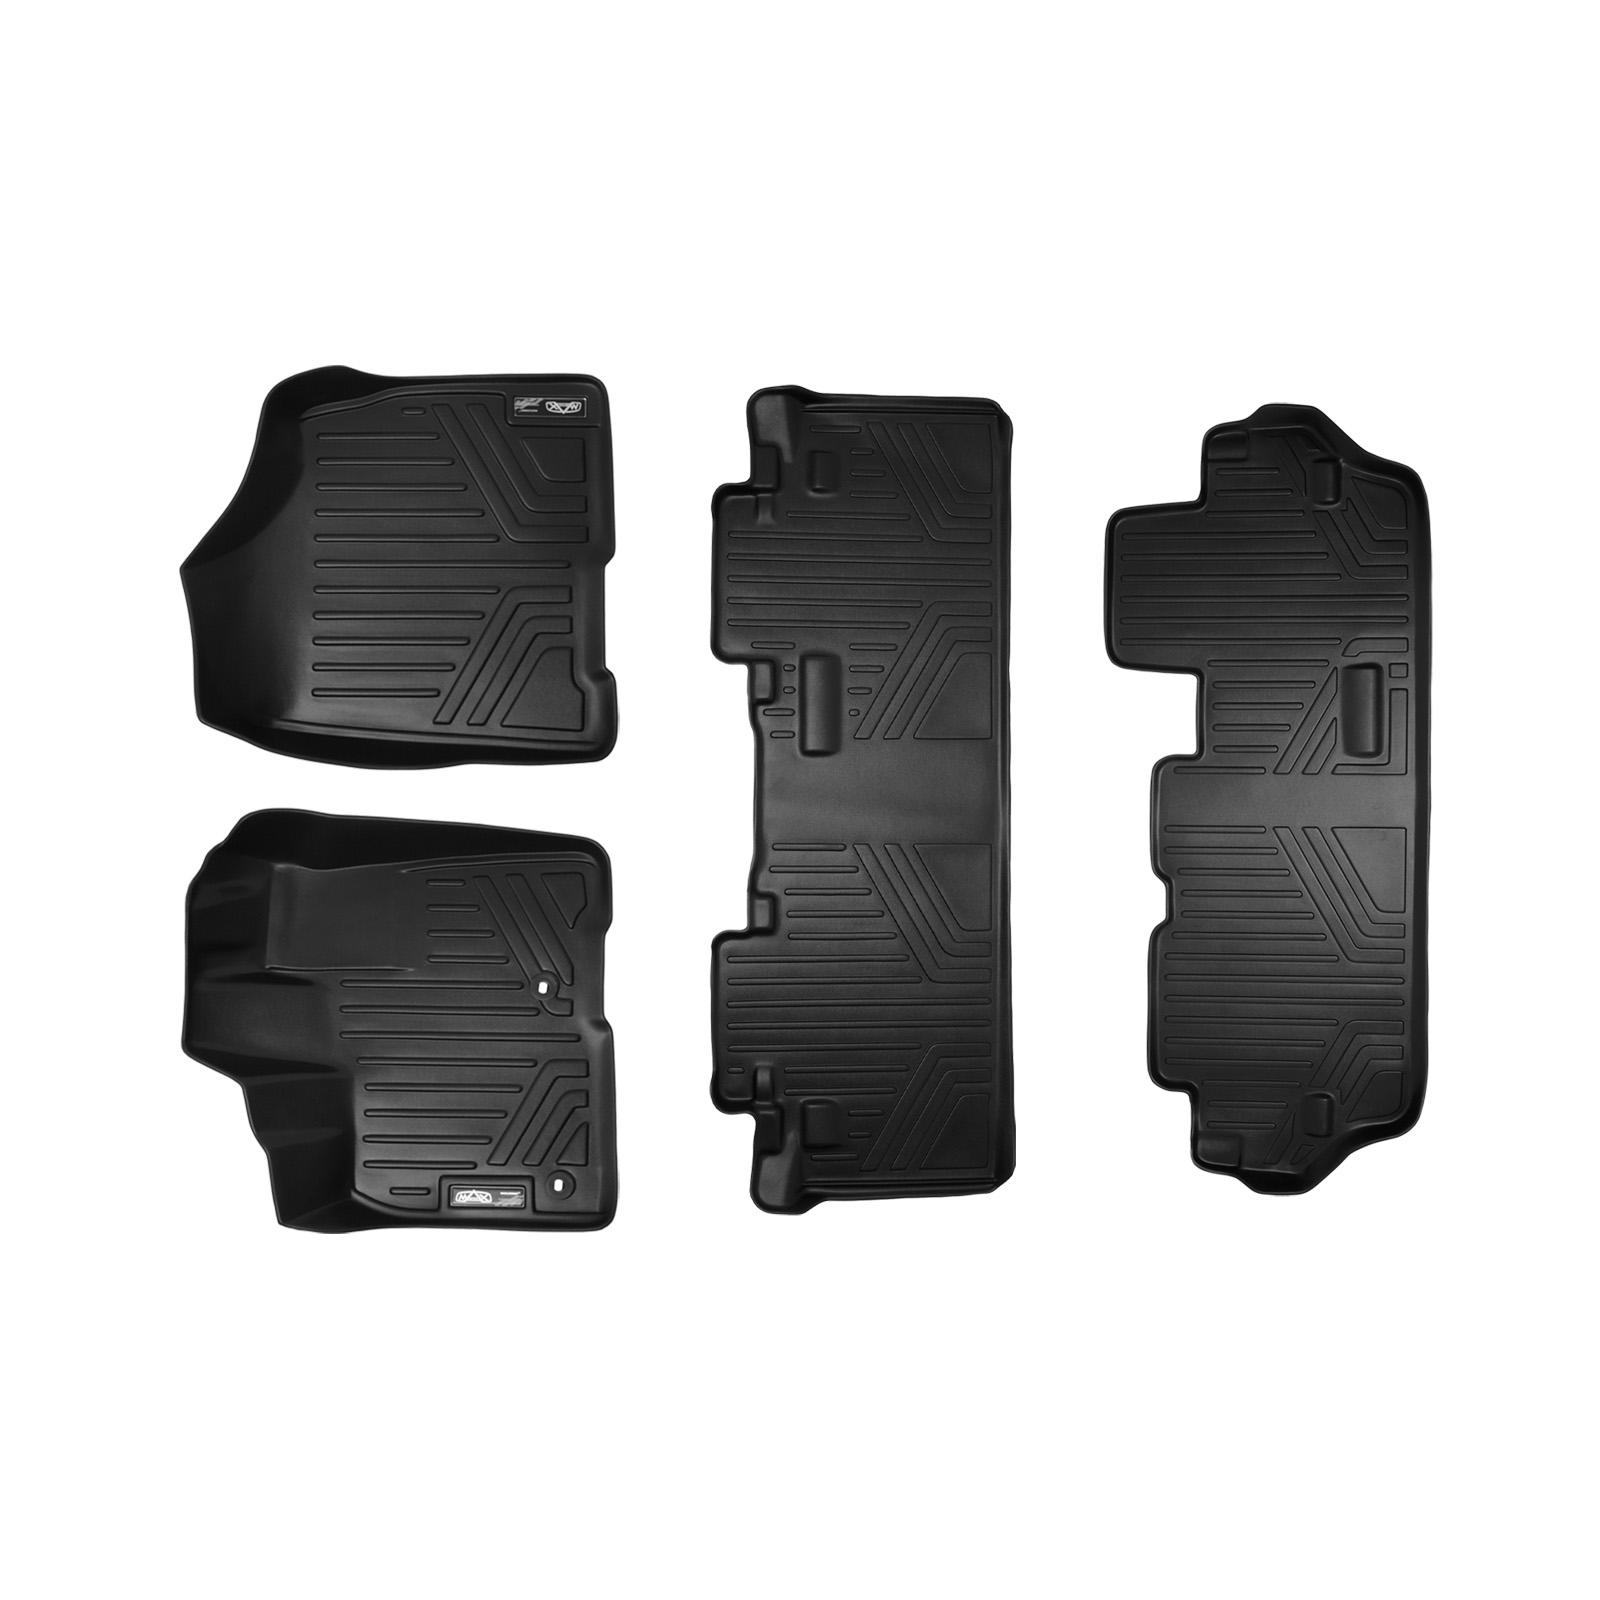 MAXFLOORMAT All Weather Floor Mats Liner (3 Row) Set for Sienna 8seats (Black)